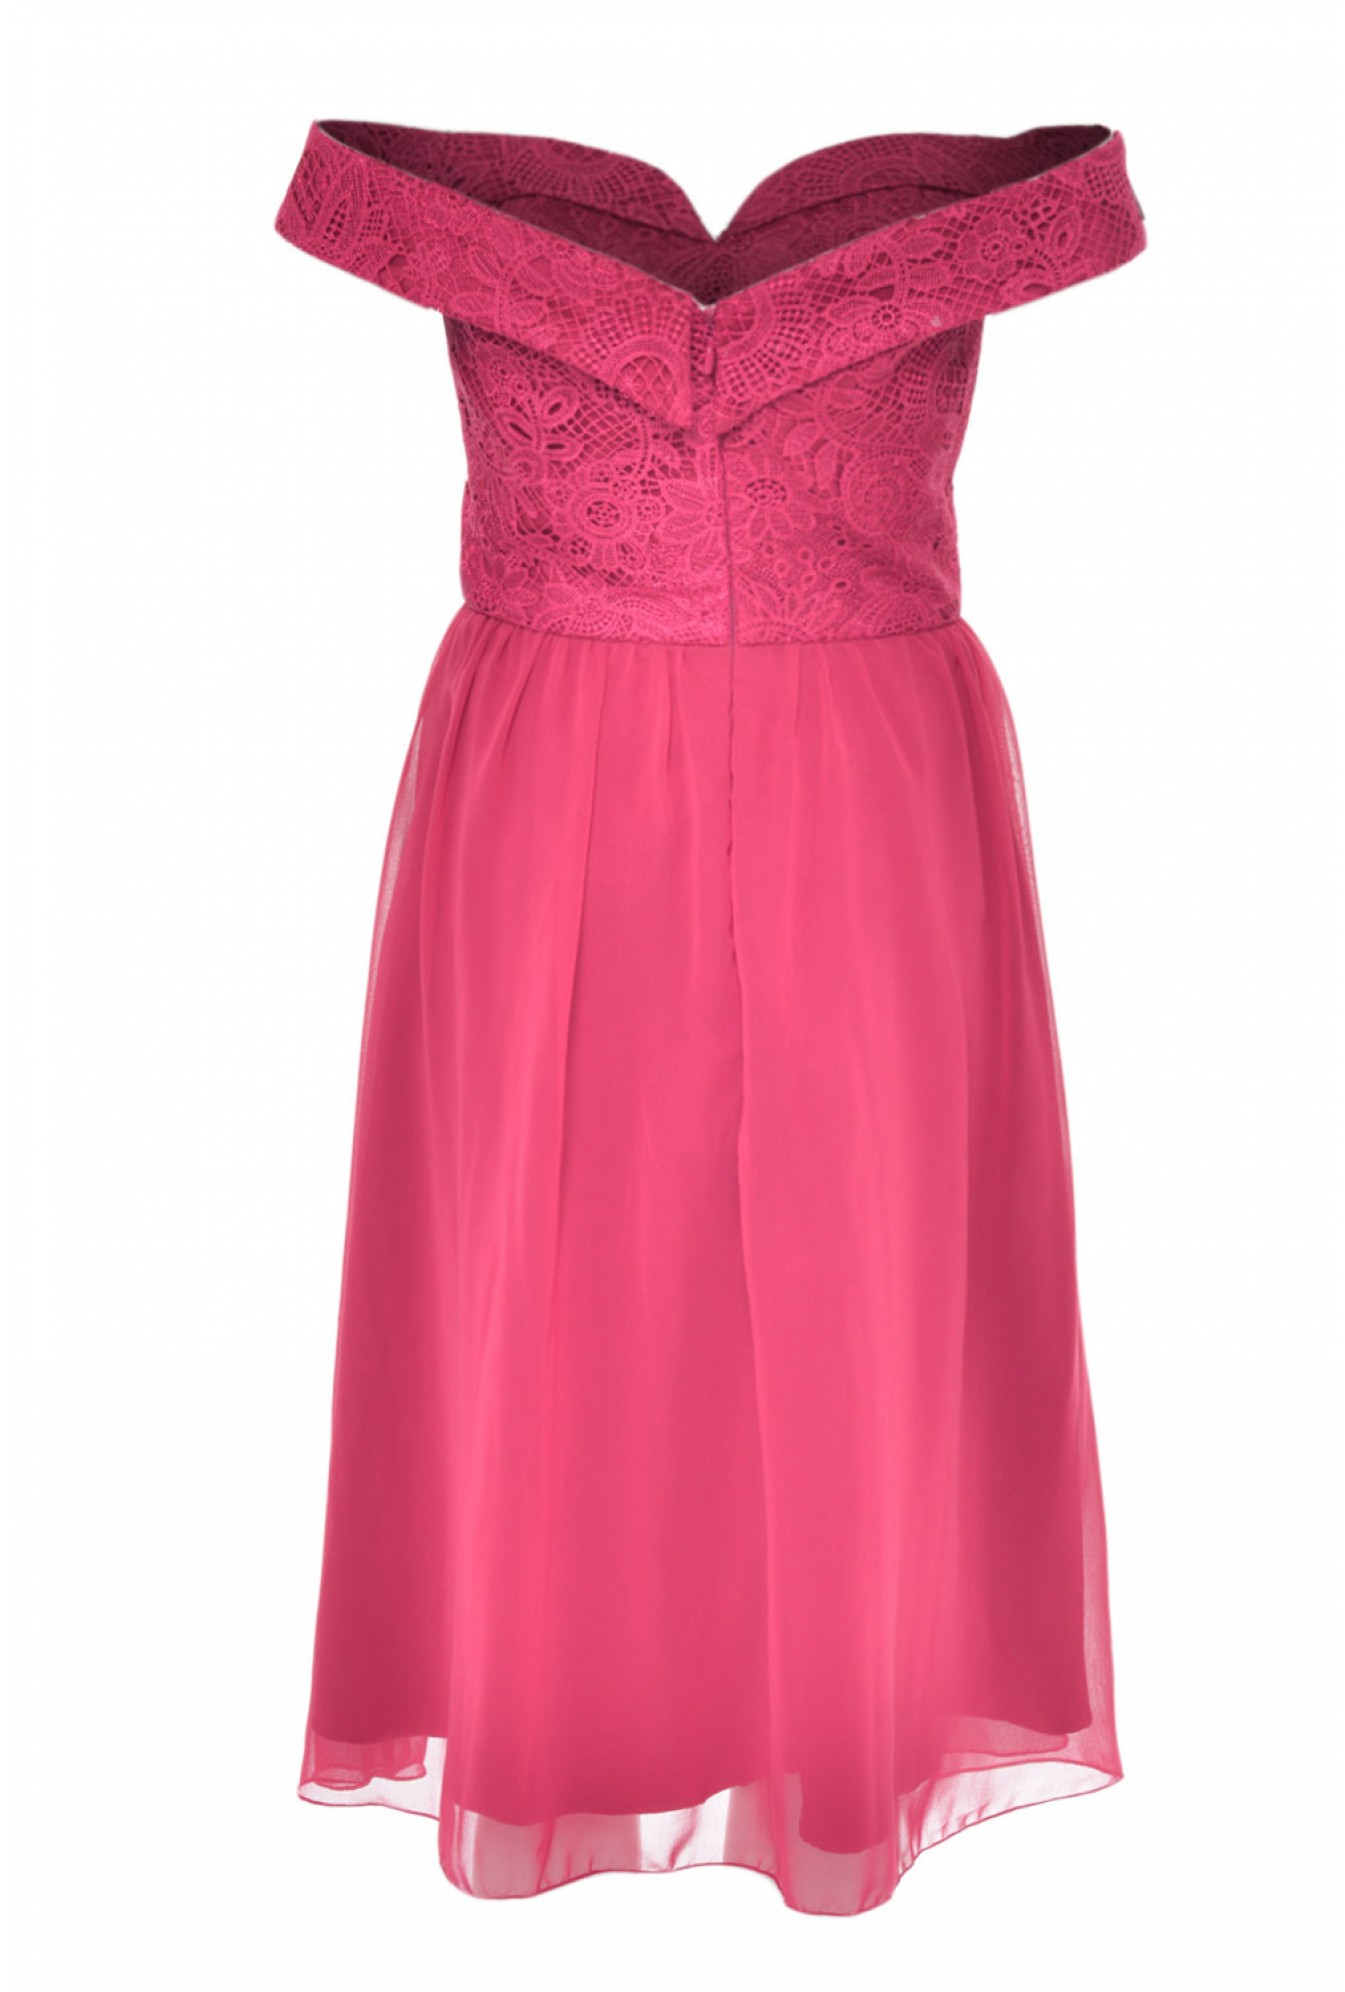 a861f984e4b4 More Views. Mary-Kate Bardot Dress in Raspberry